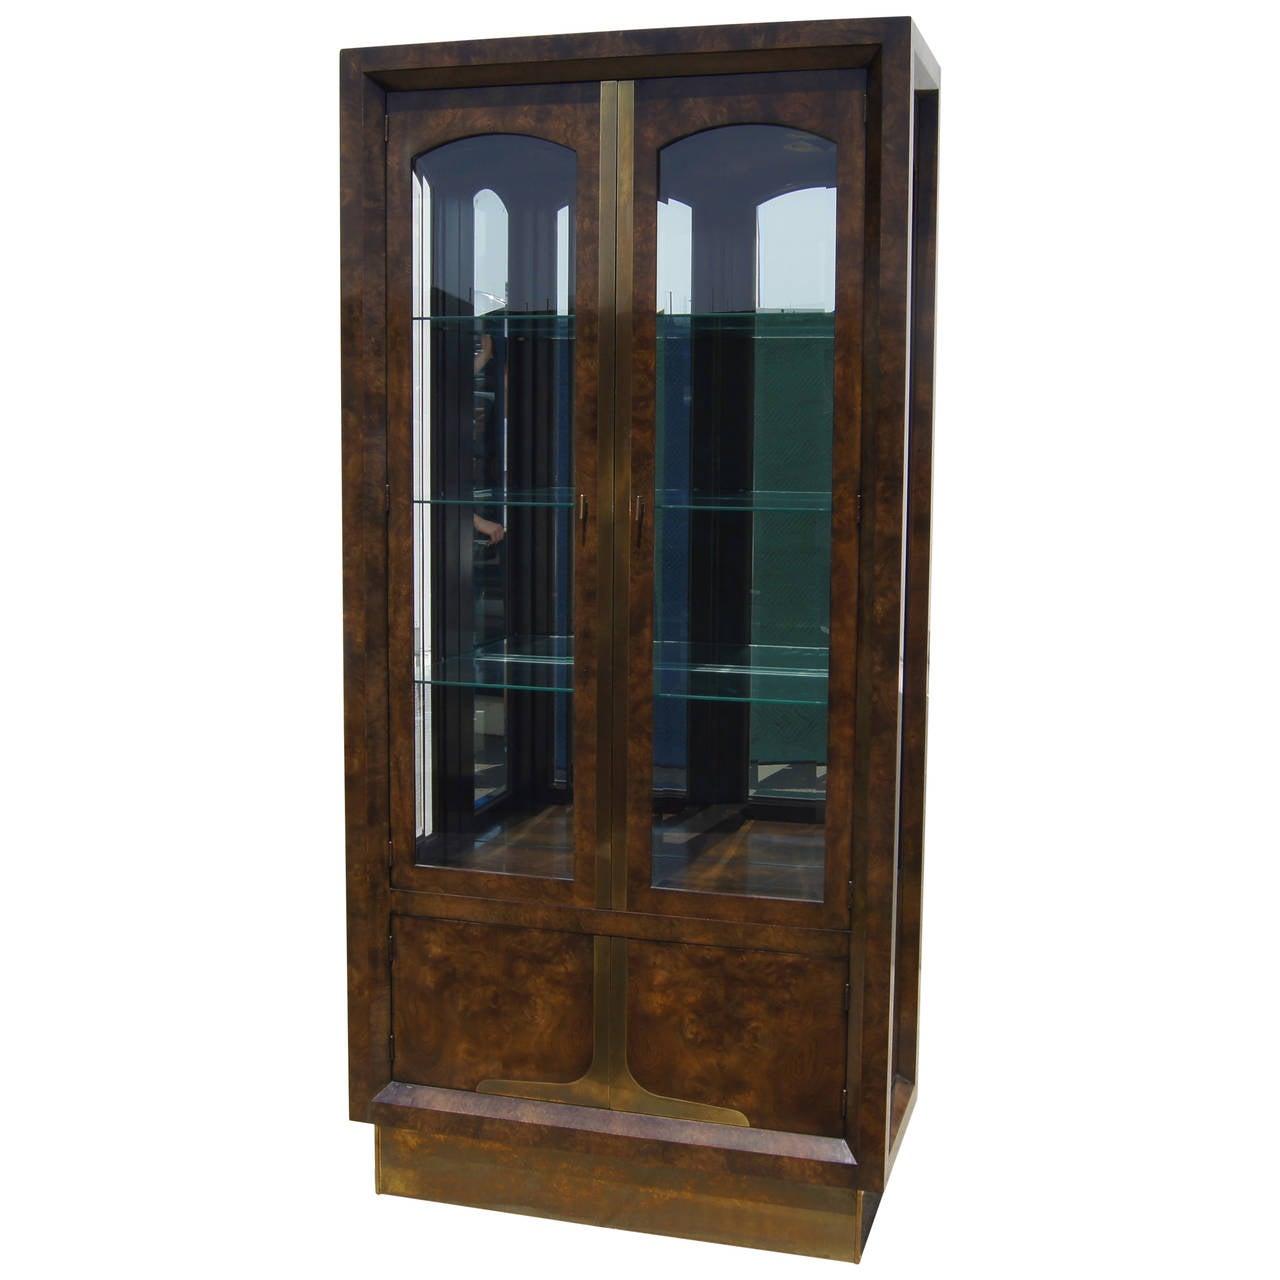 Tall Amboyna Wood and Brass Cabinet by William Doezema for Mastercraft